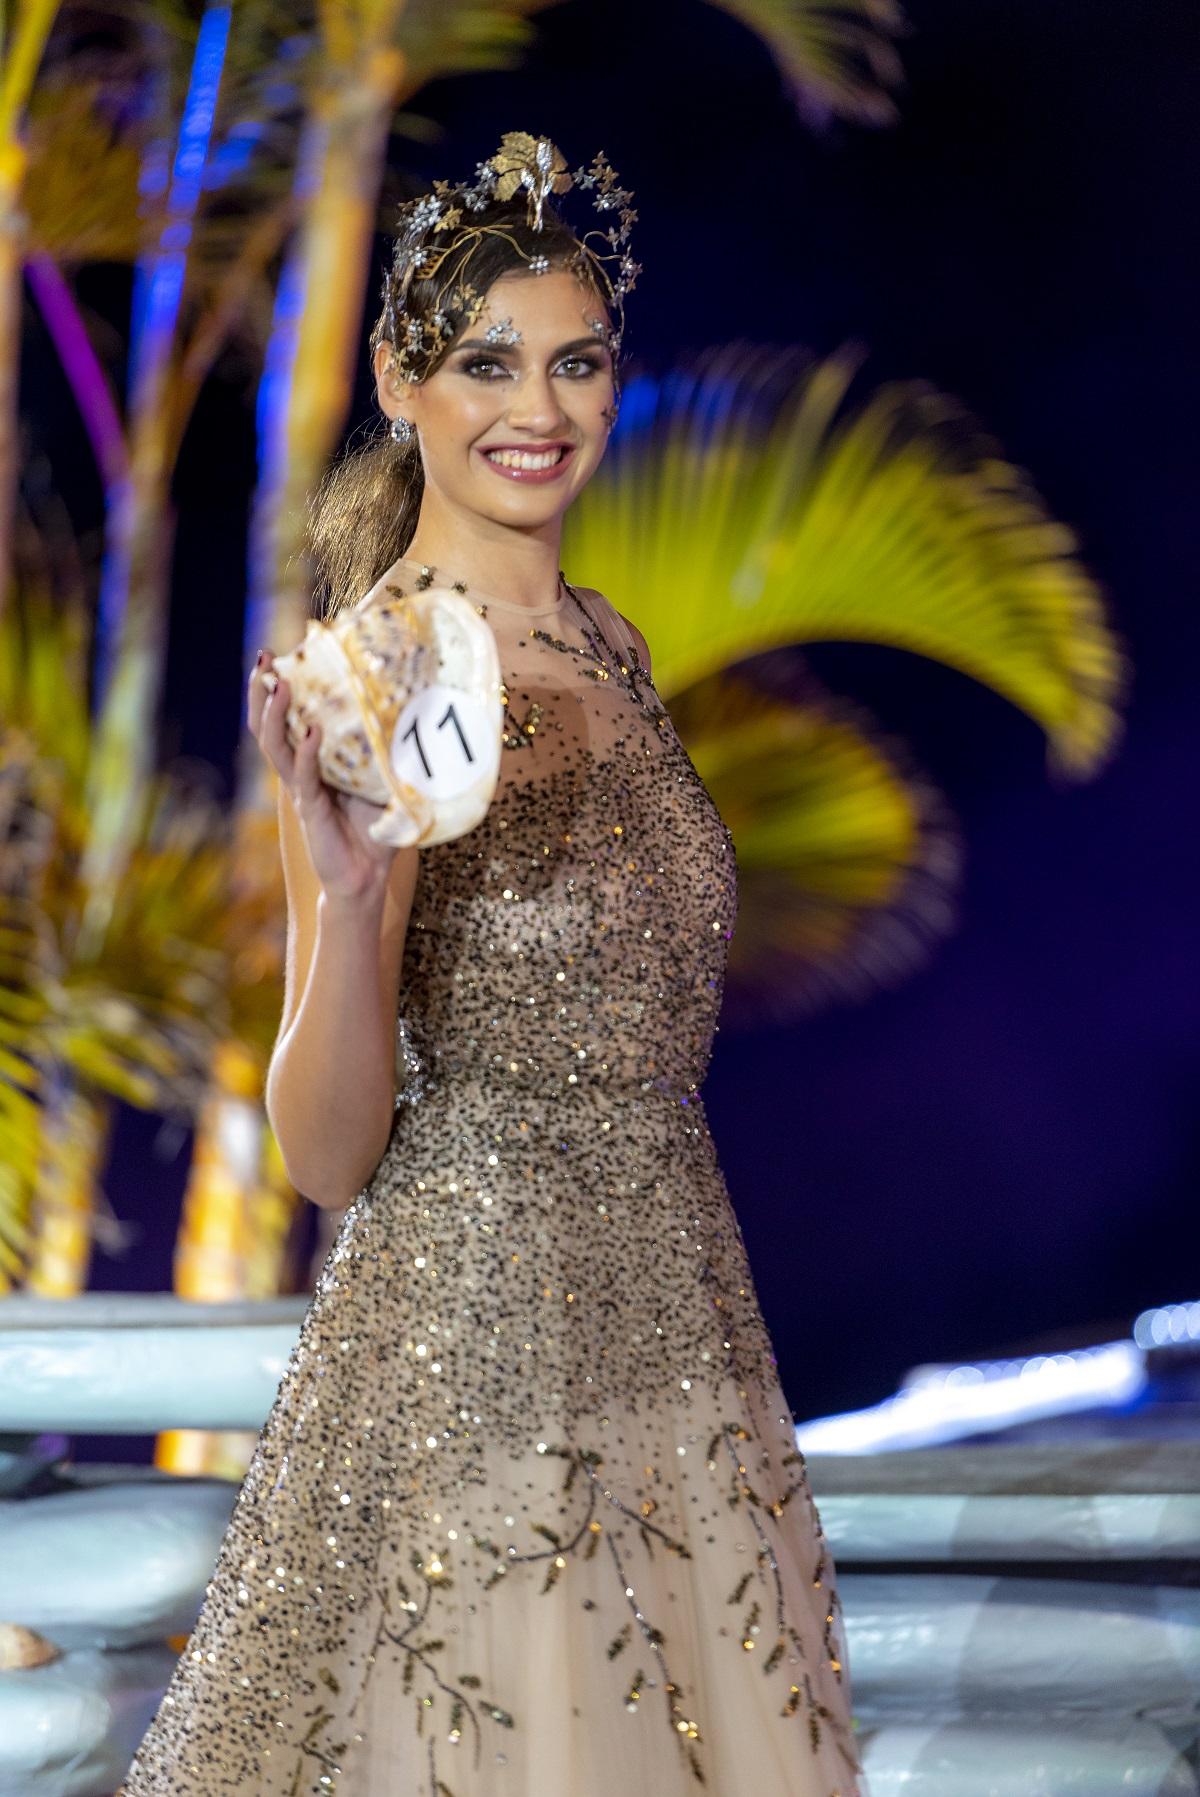 Ariadna Fregel, candidata a Reina del Carnaval por DIARIO DE AVISOS, ChinaTown y Partilandia / Foto: I Love The World